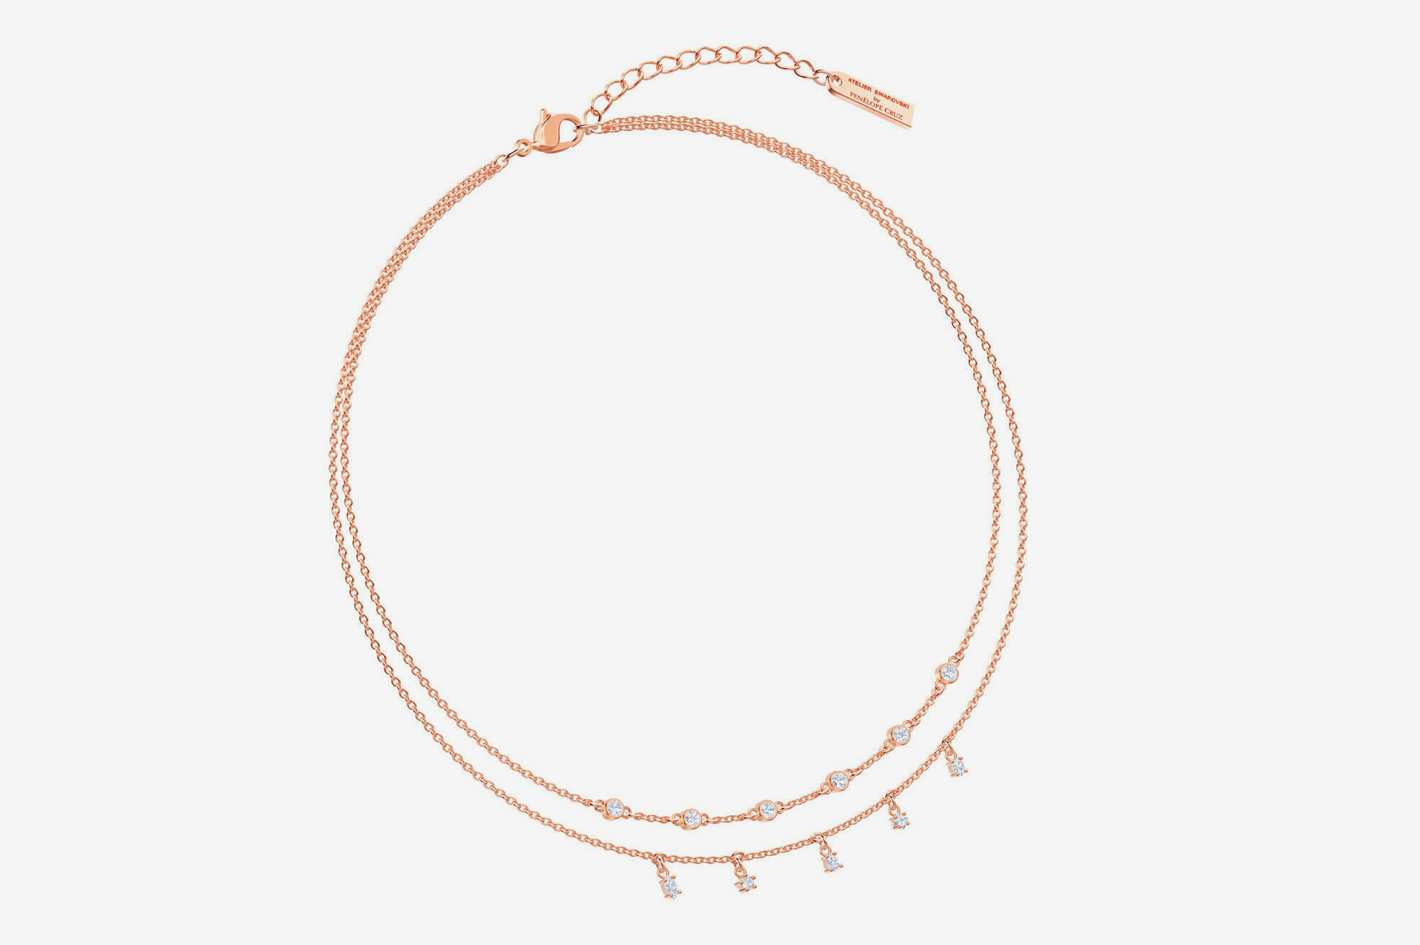 Swarovski X Penélope Cruz Moonsun Double Necklace